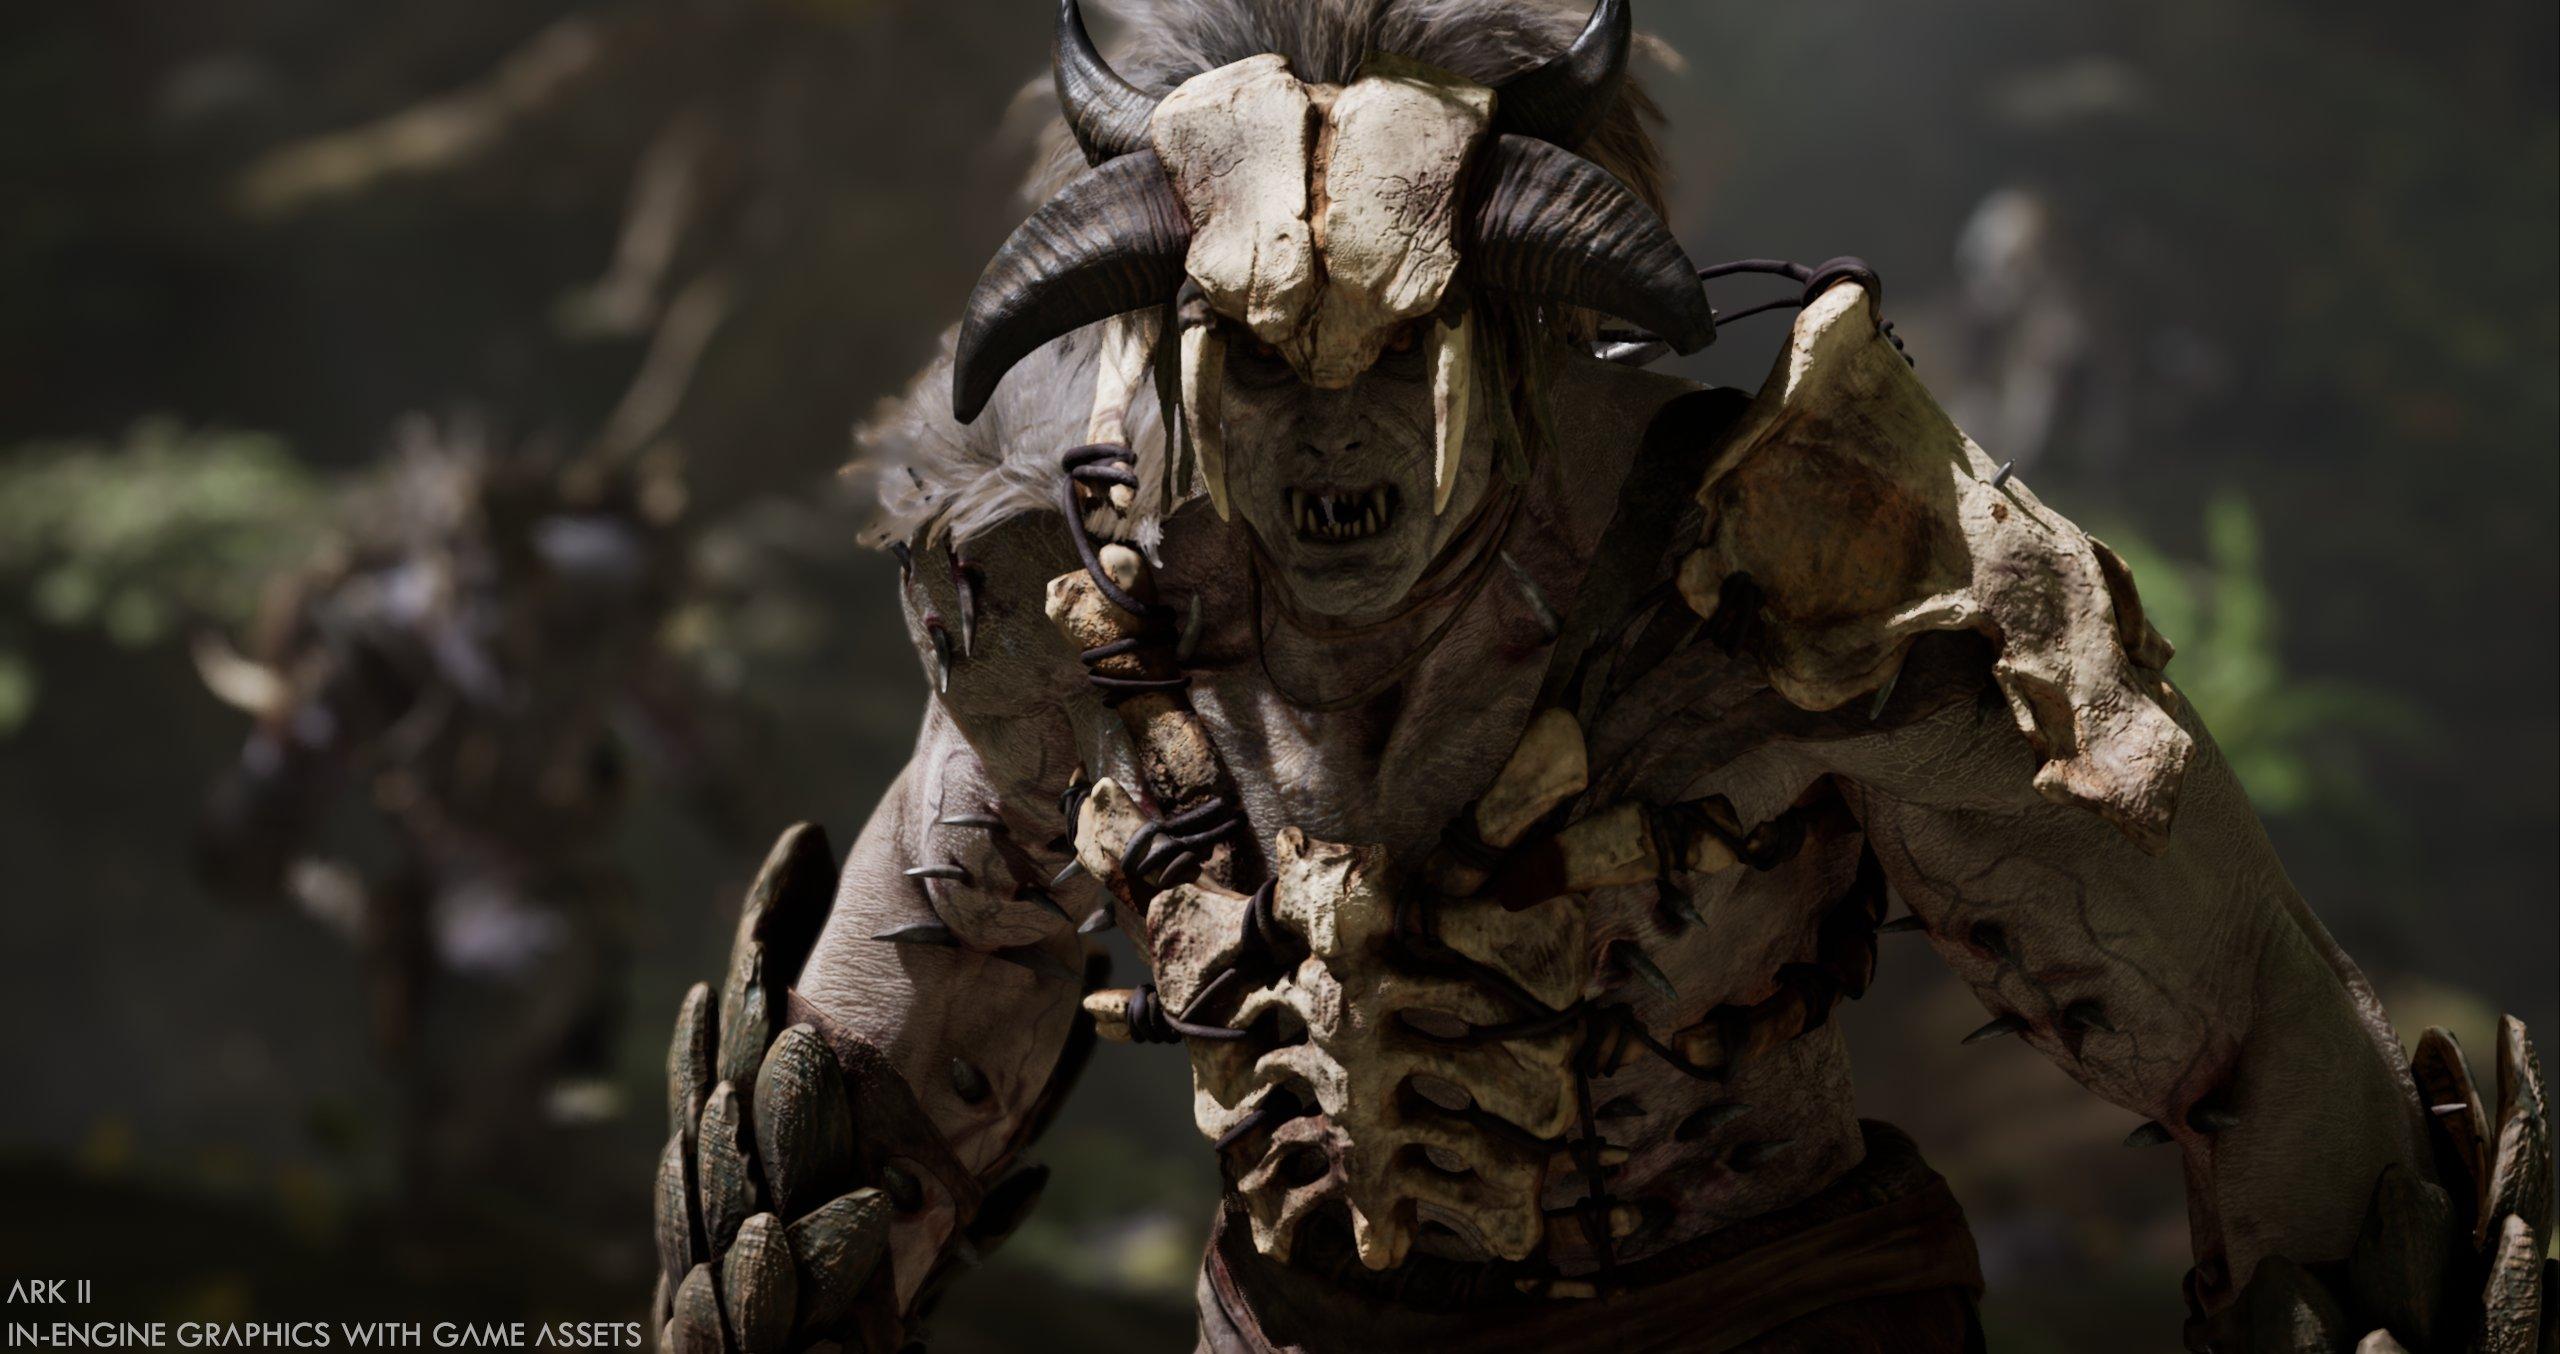 TGA 2020: Кинематографический трейлер Ark 2 с Вином Дизелем